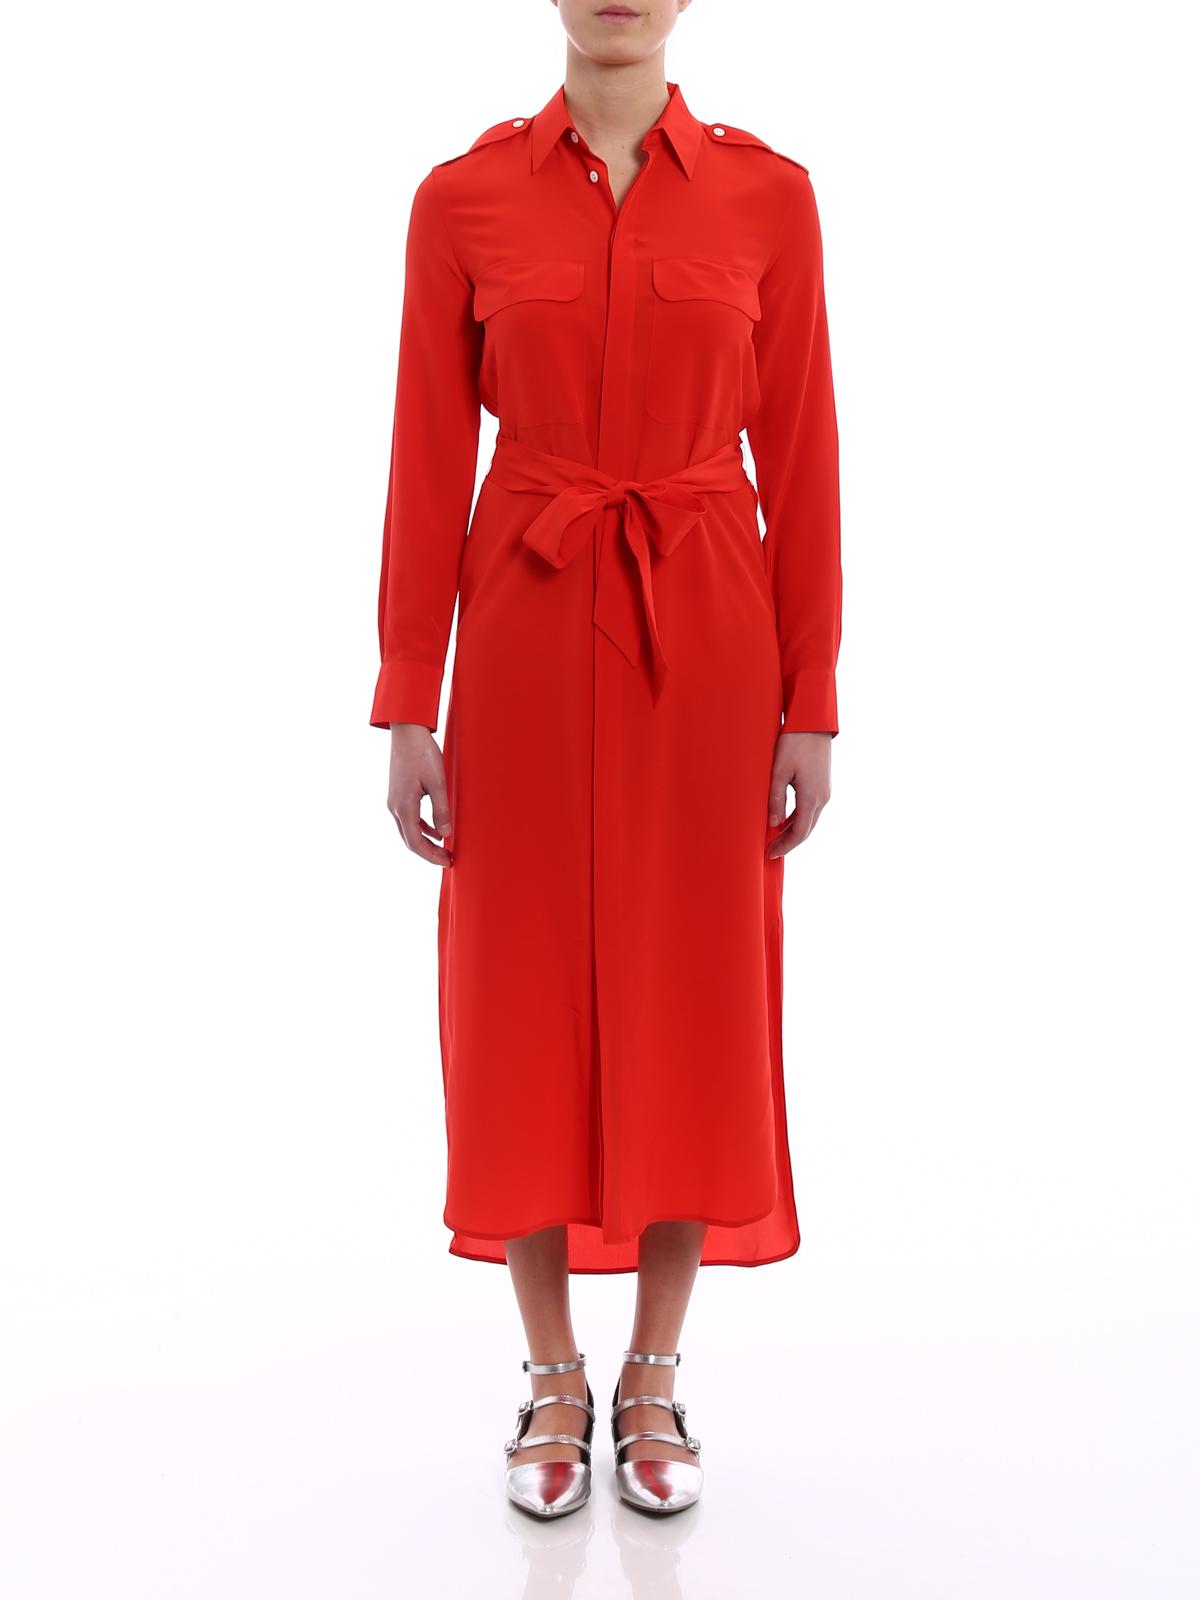 Polo Ralph Lauren - Maxi Robe - Rouge - Maxi robe - 211707985002 aabb5b6aab8